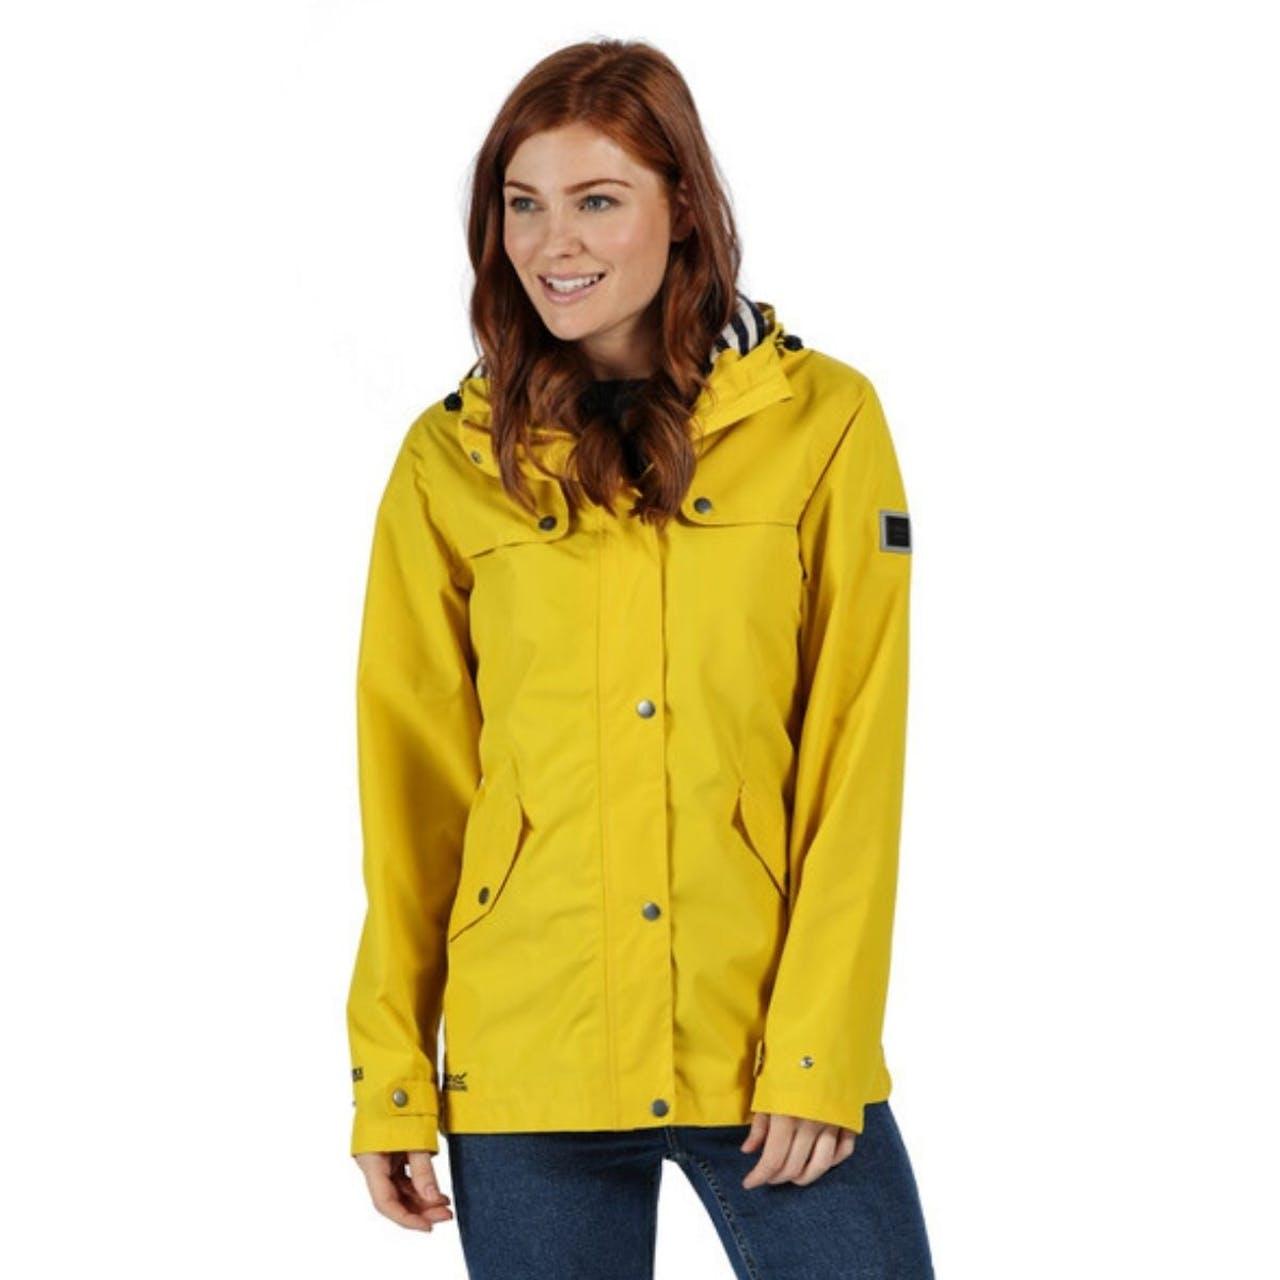 Regatta Bertille Ladies Yellow Jacket Front